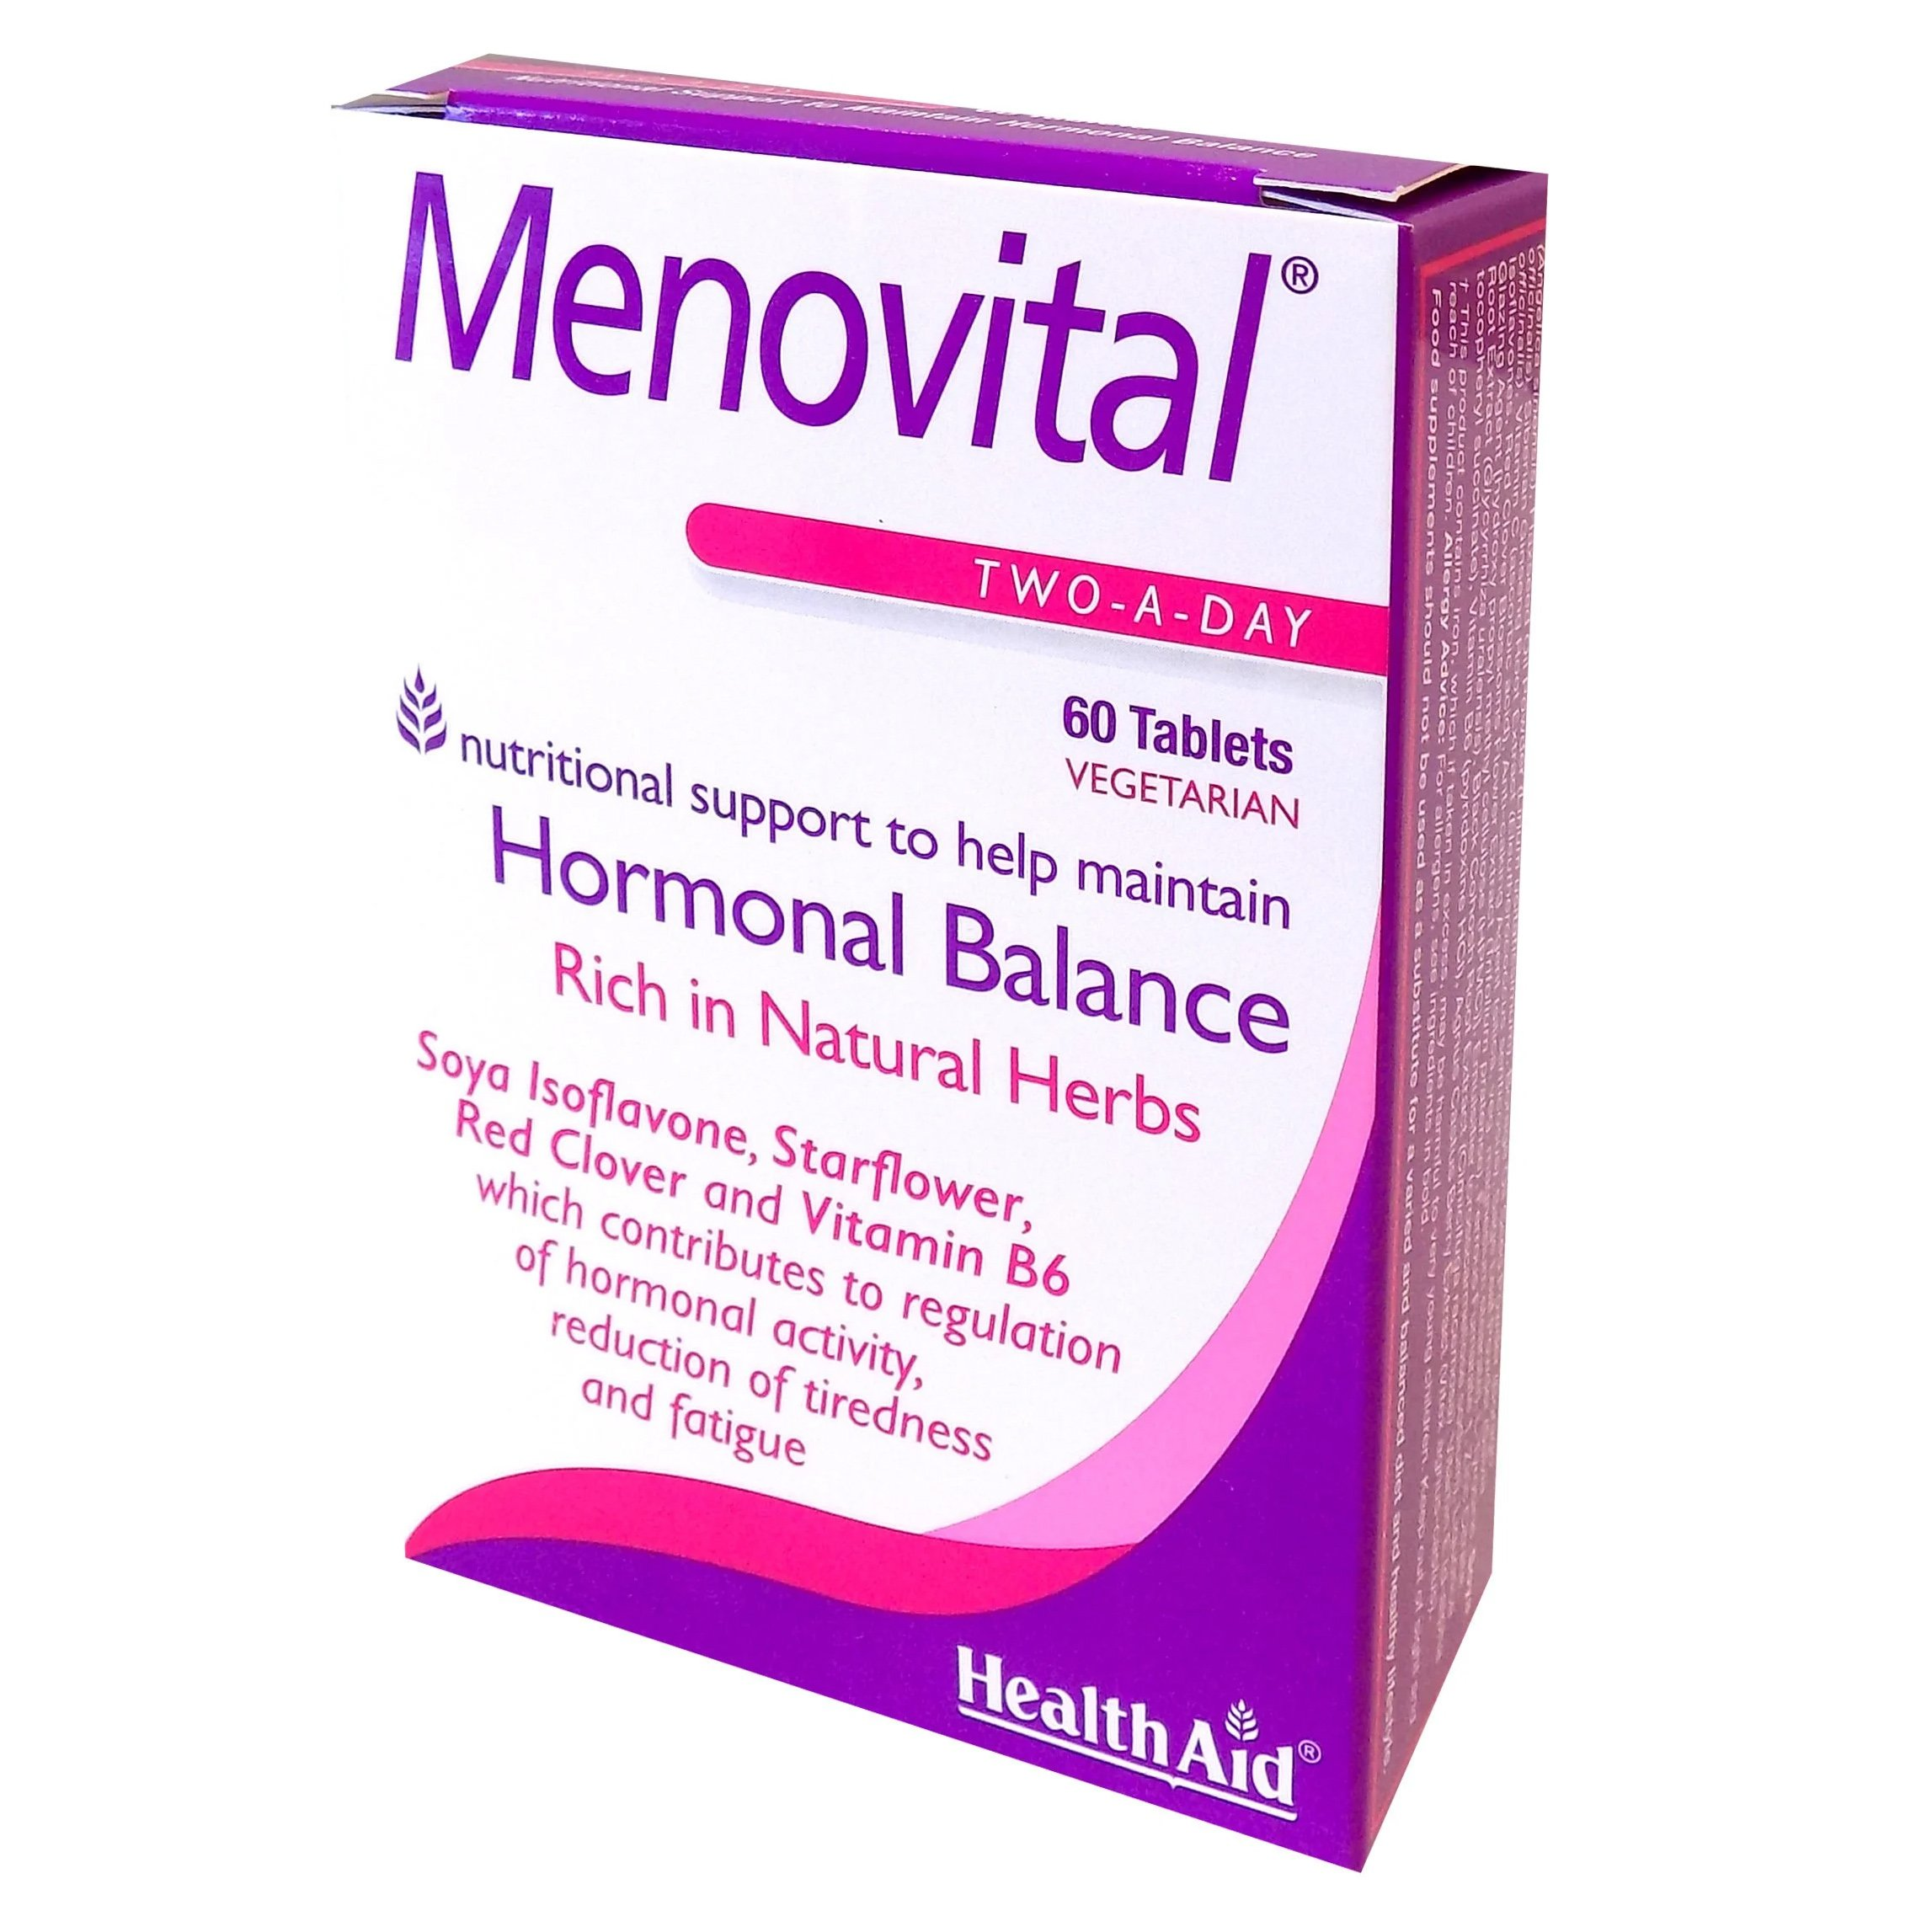 Health Aid Menovital Συμπλήρωμα Διατροφής, Φροντίδα για την Εμμηνόπαυση 60tabs